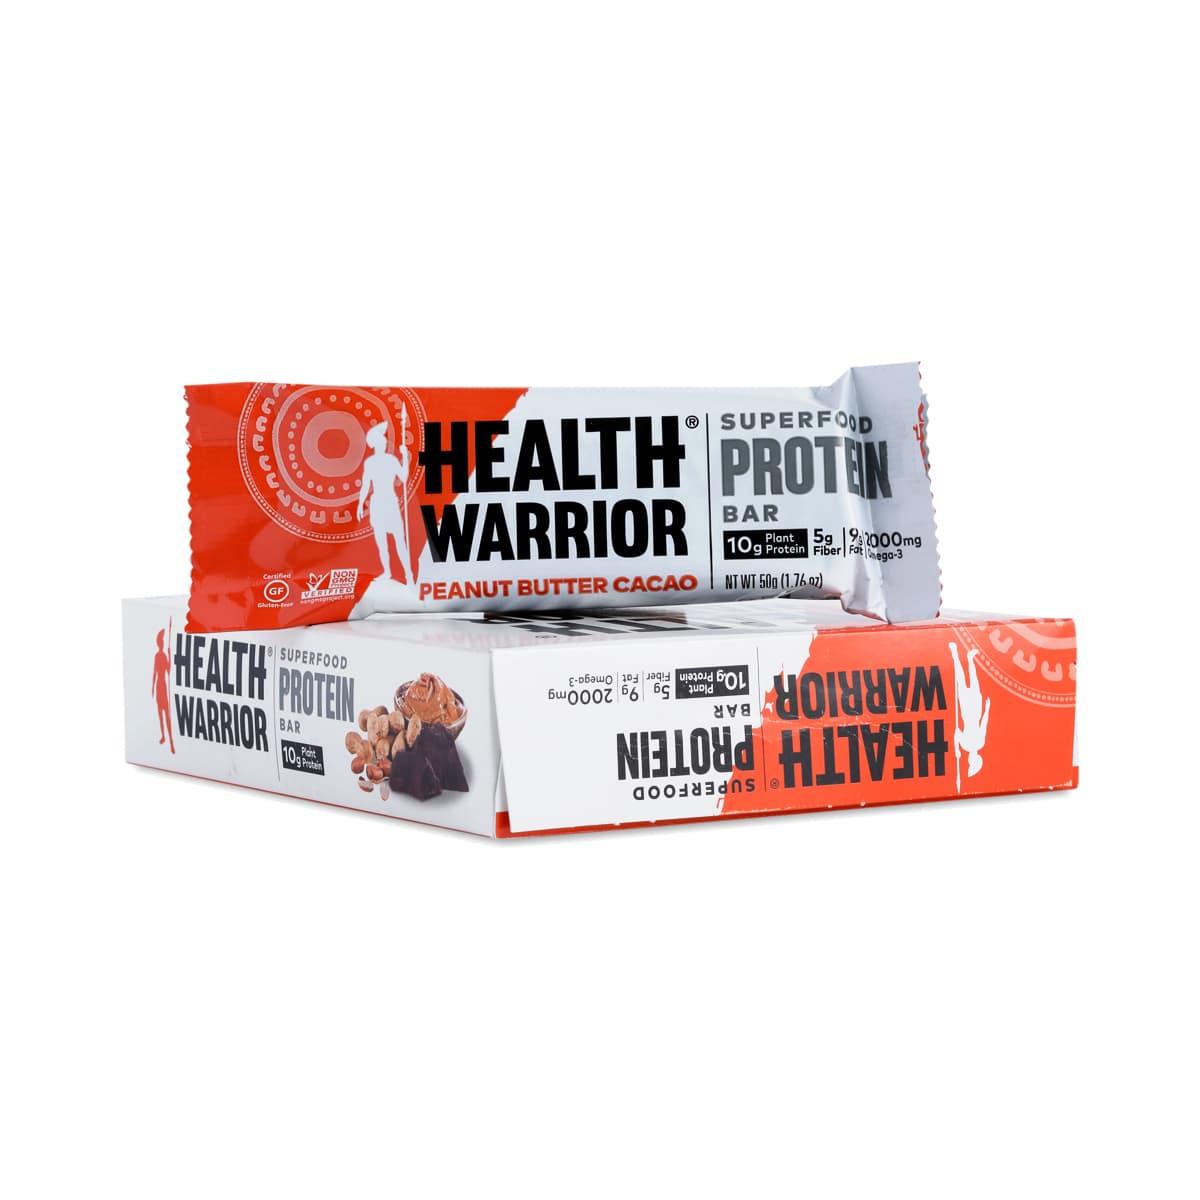 Warrior health products